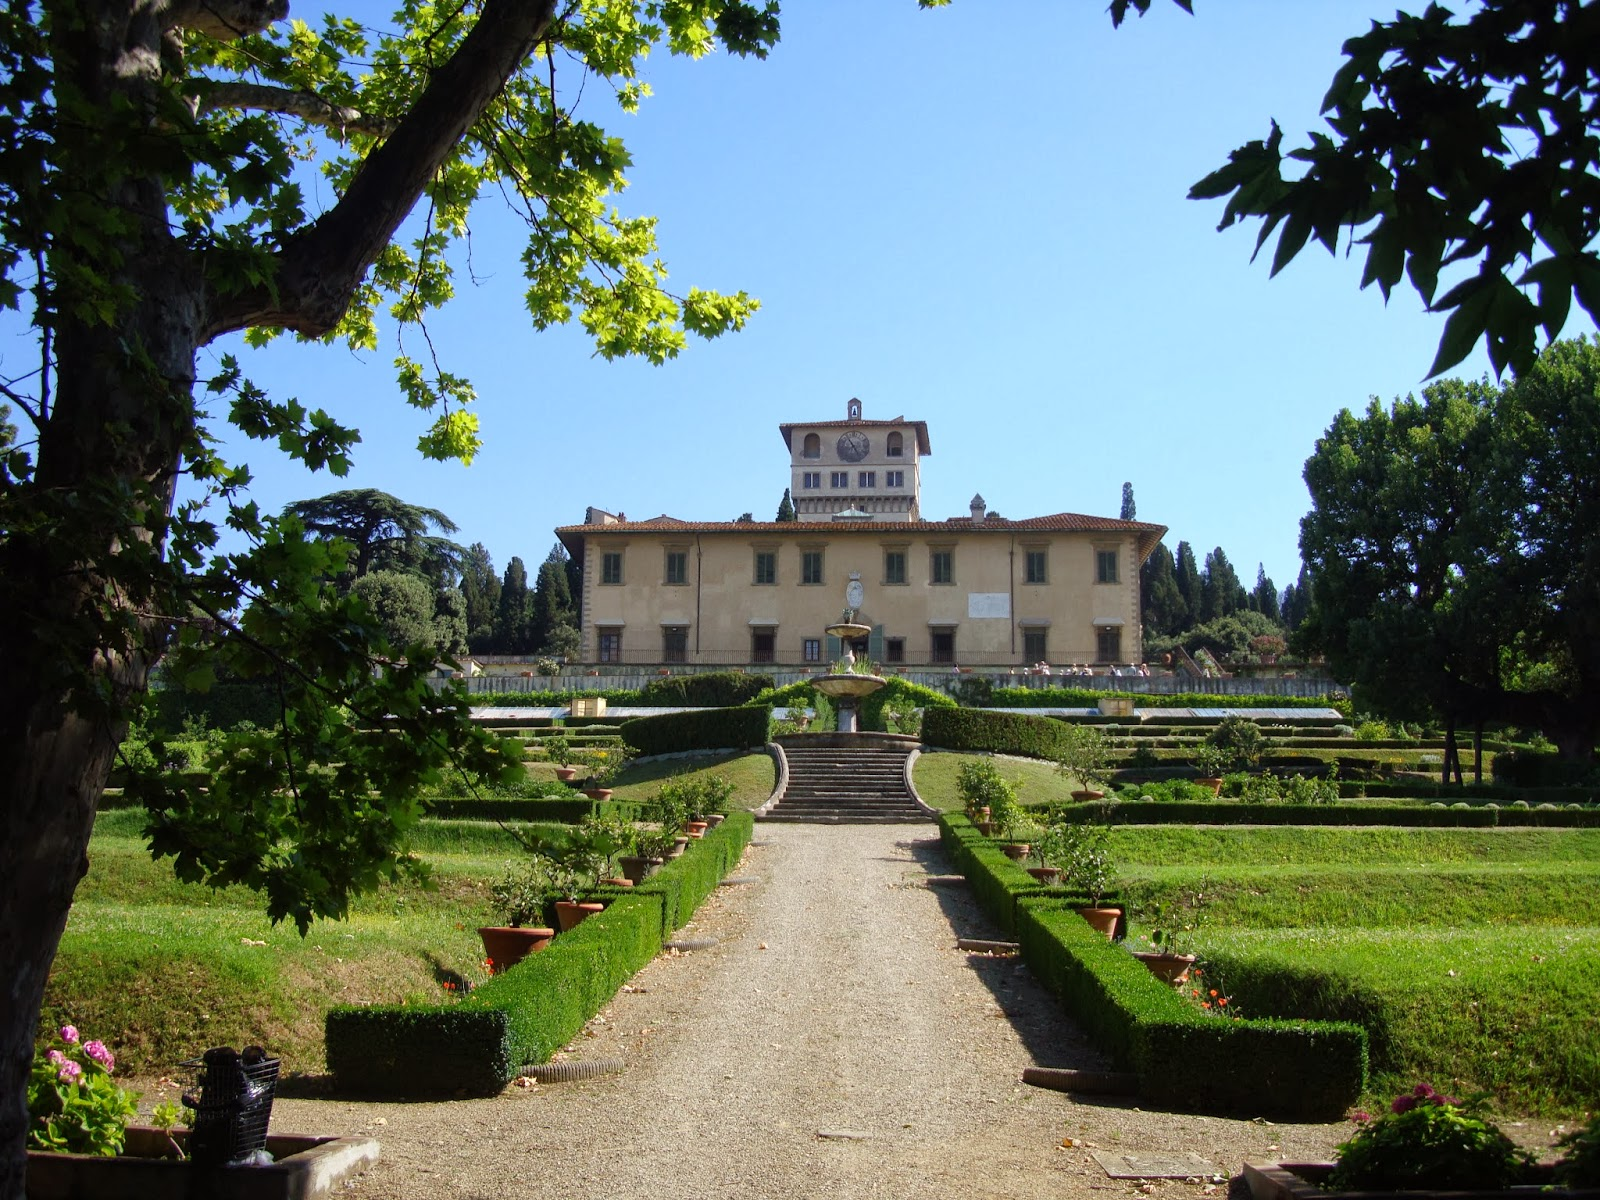 Hortibus voyage parcs et jardins de champagne en for Jardin de toscane